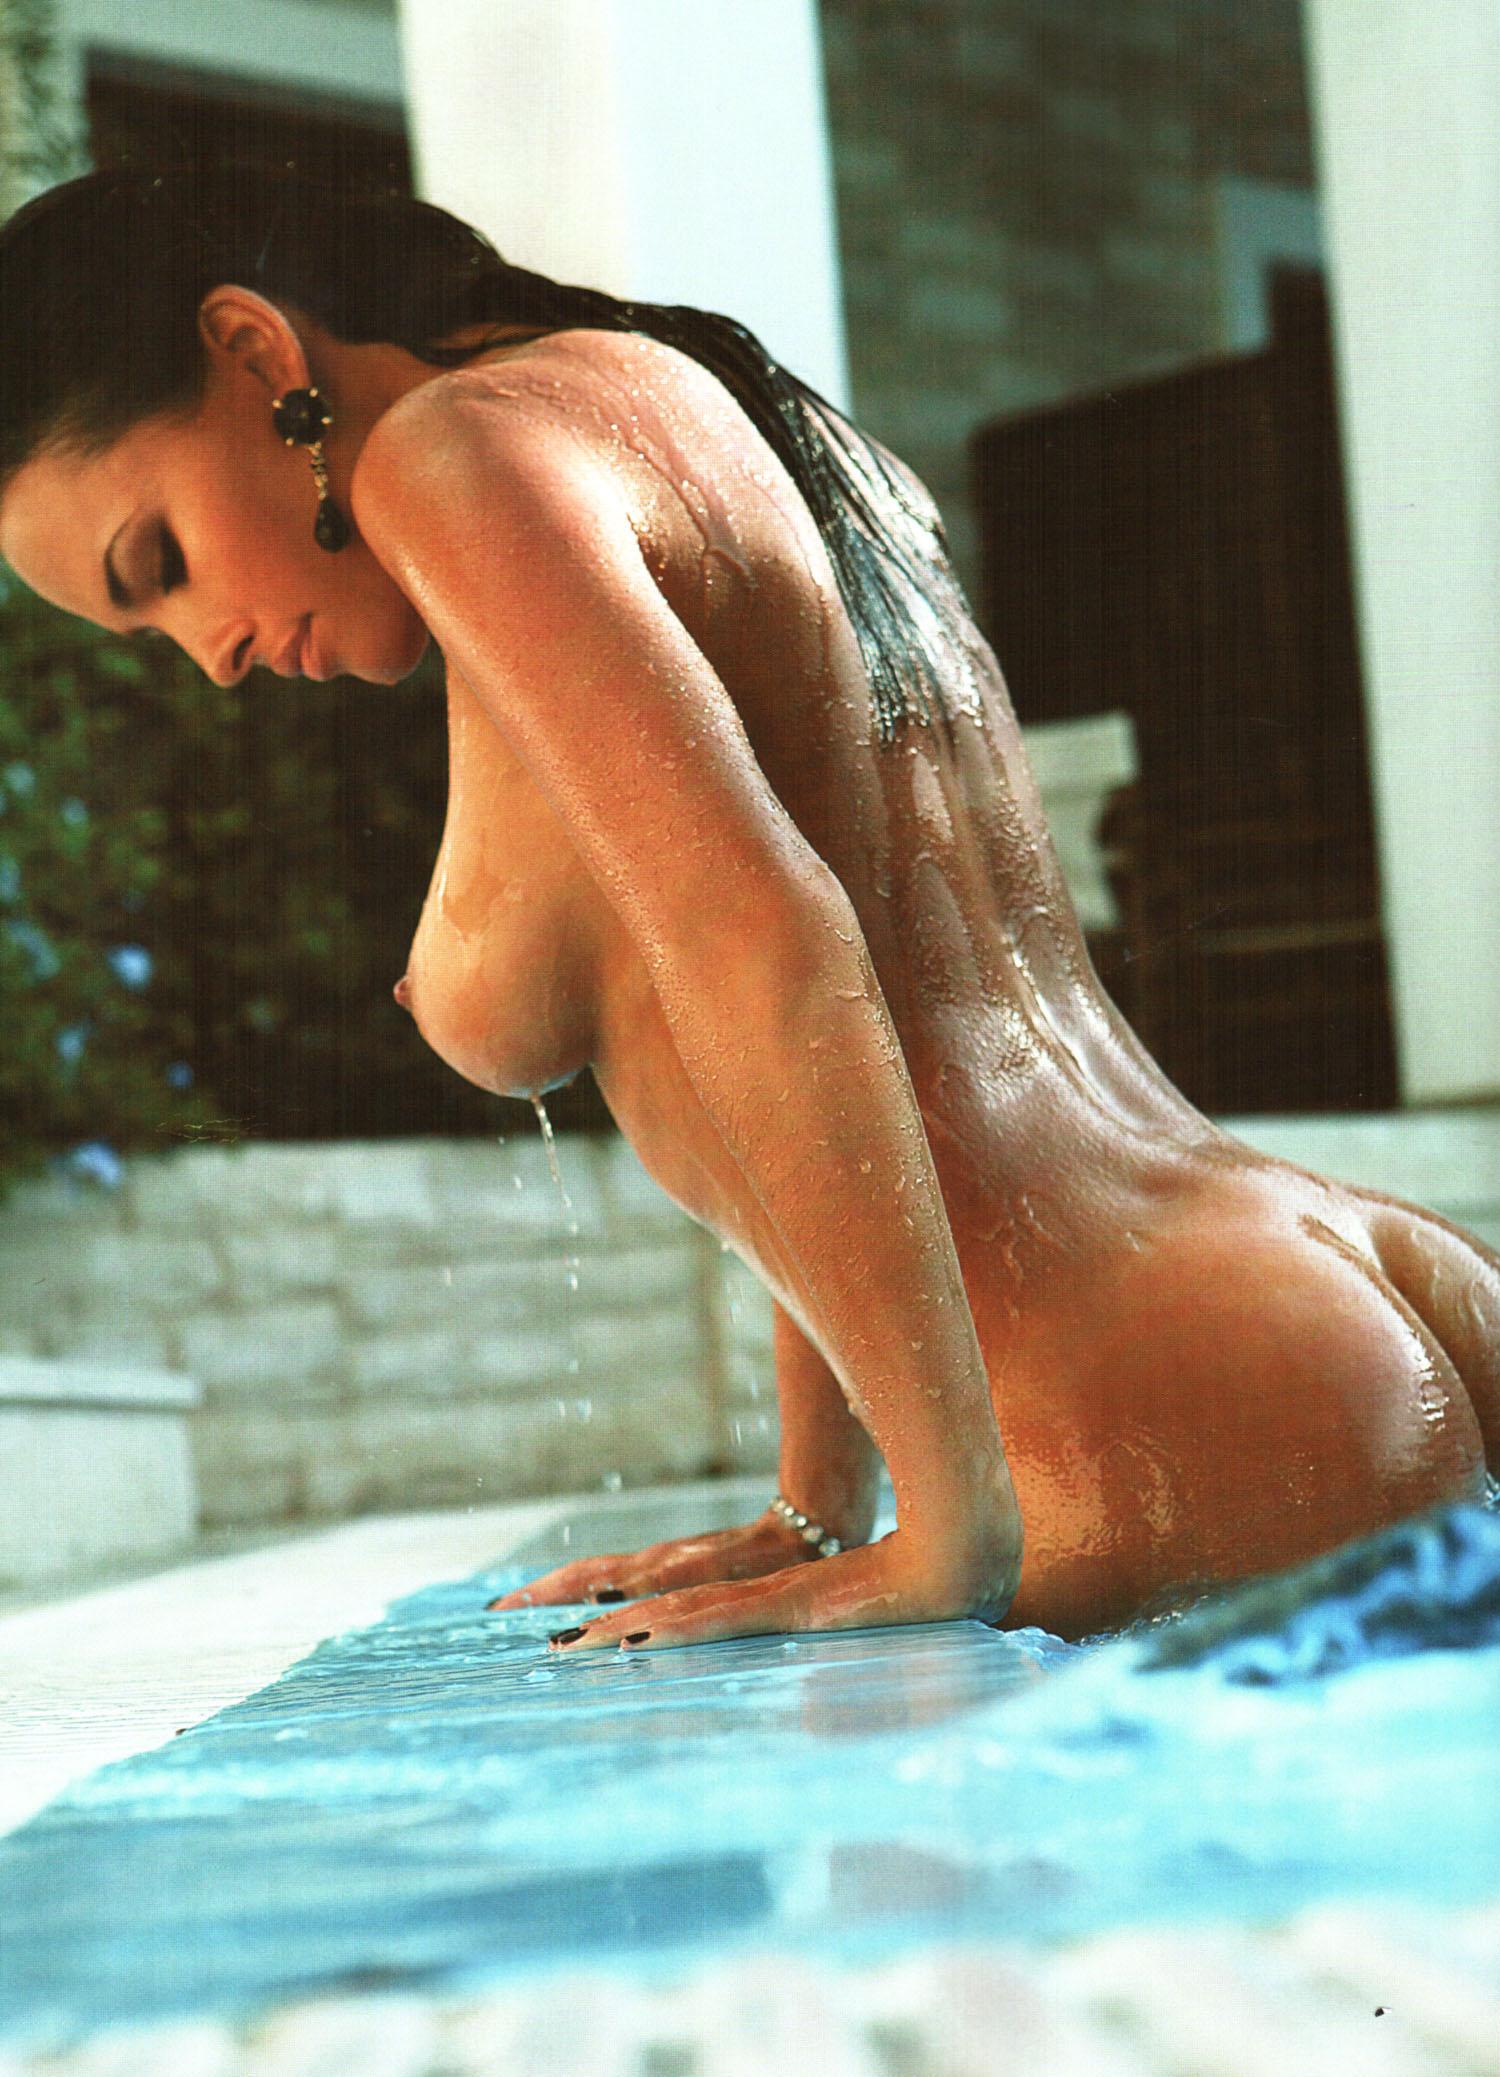 59393_Playboy_Ukraine_12-2007_9_122_442lo.jpg